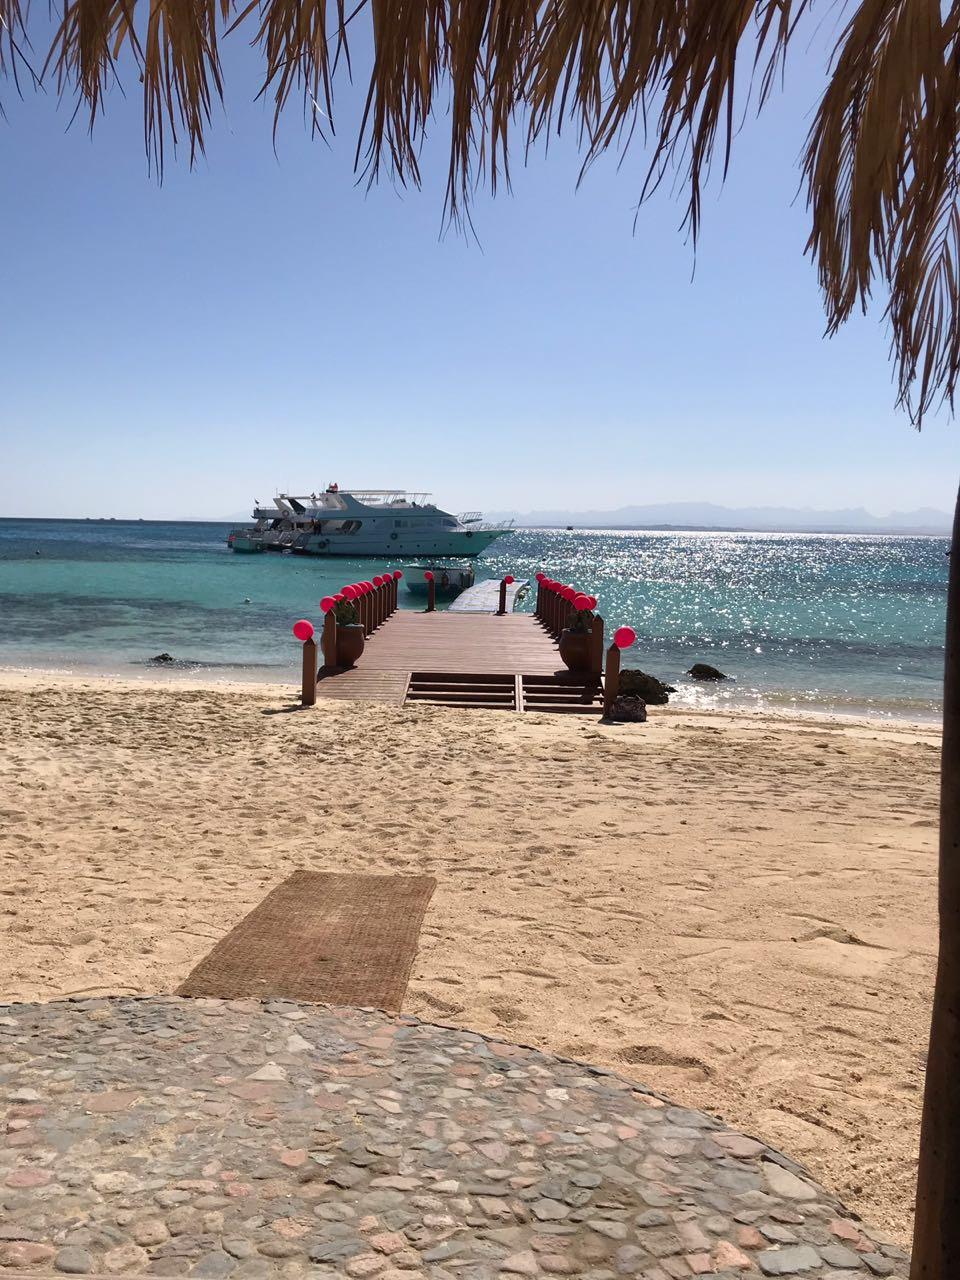 Schnorchelausflug zur Utopia Insel ab Makadi Bay/Sahl Hasheesh